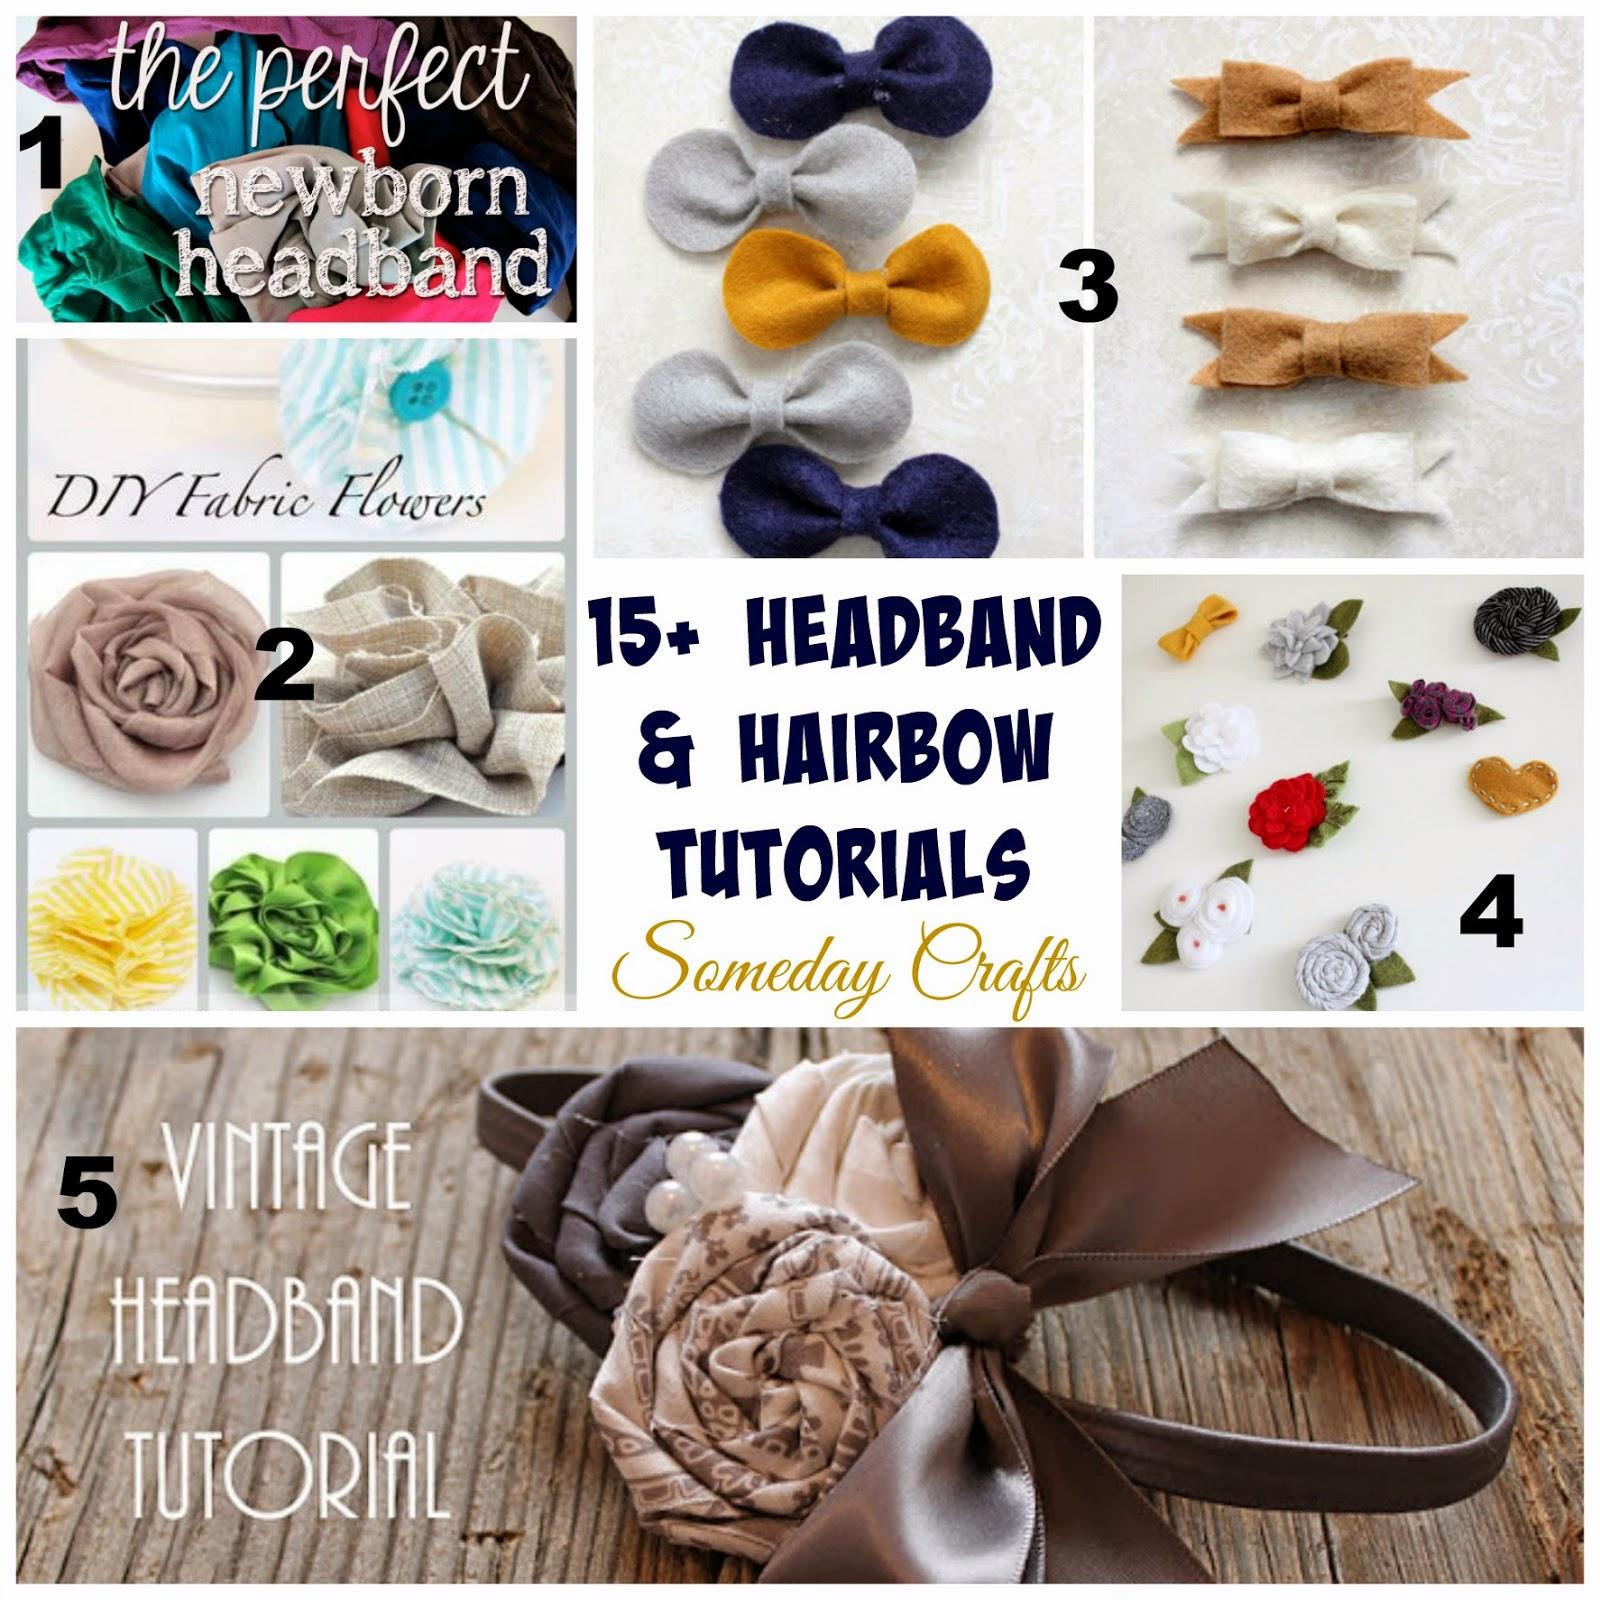 http://4.bp.blogspot.com/-RpPUP_OsEVQ/VMCjUo8sg3I/AAAAAAAACZI/mq6875y9Ryg/s1600/HeadbandCollageTitleSomedayCrafts.jpg